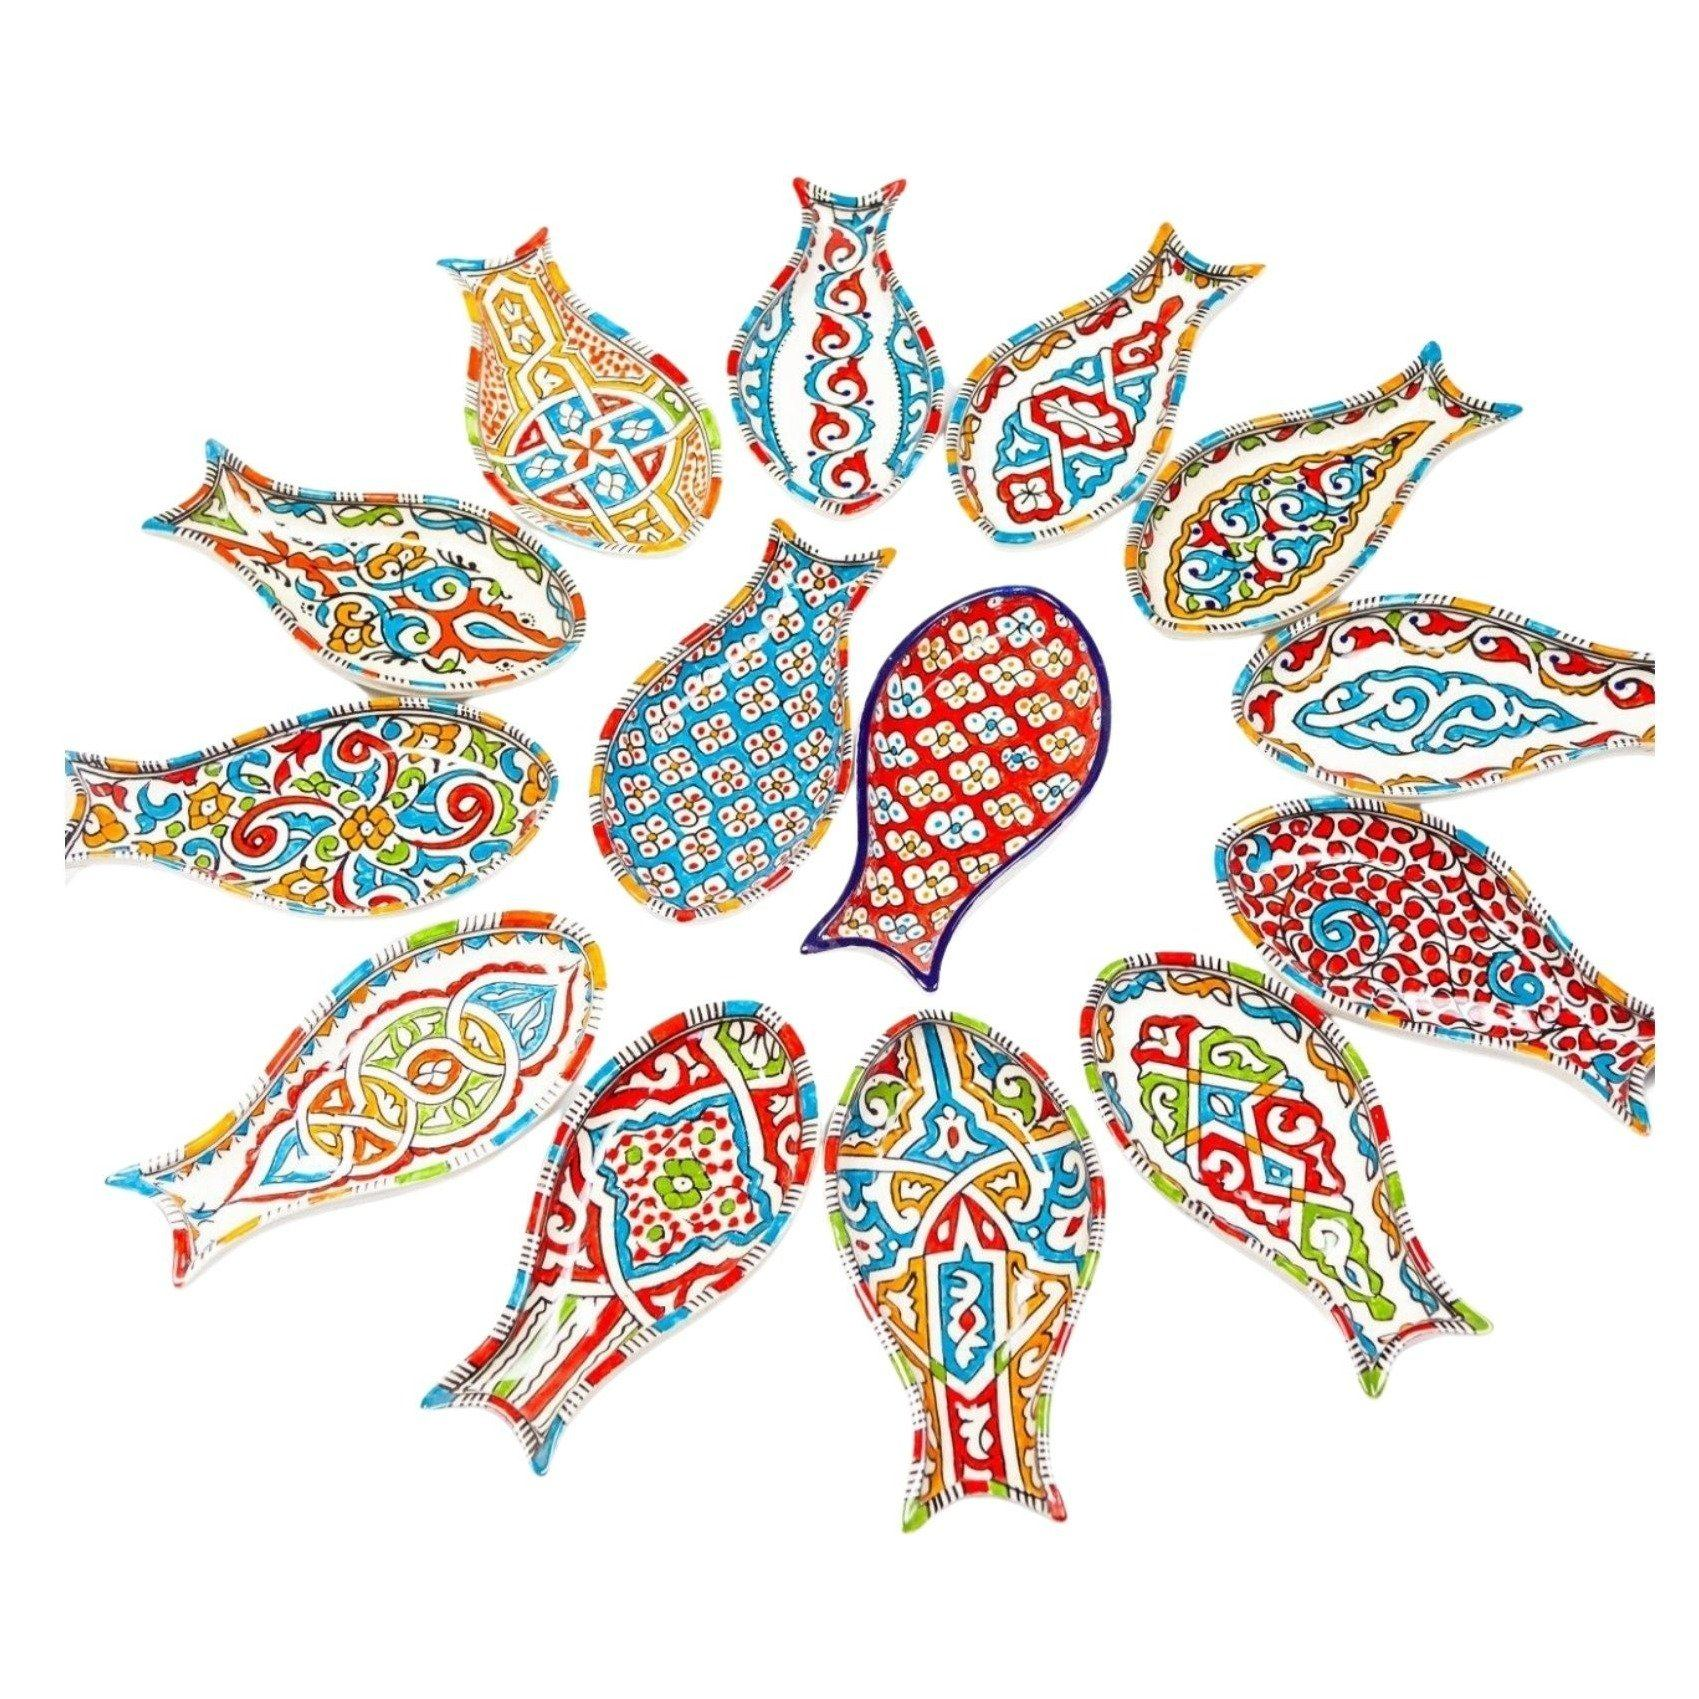 Fish Ceramic Pottery Dishes